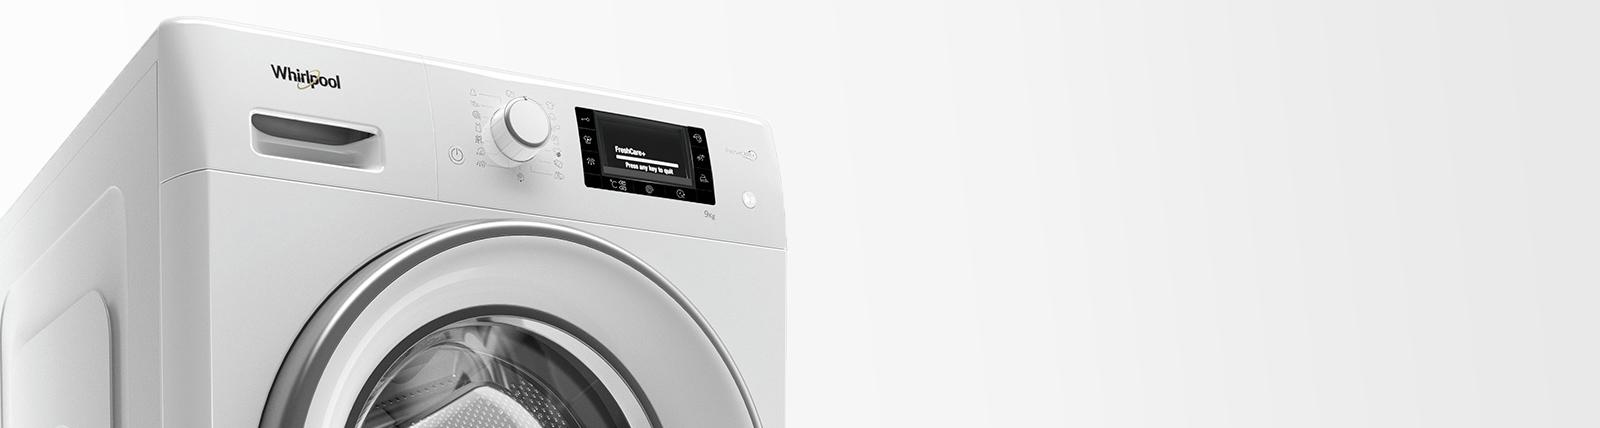 Genoeg Whirlpool wasmachine foutmelding F12 - Reparatievakman.nl JW73